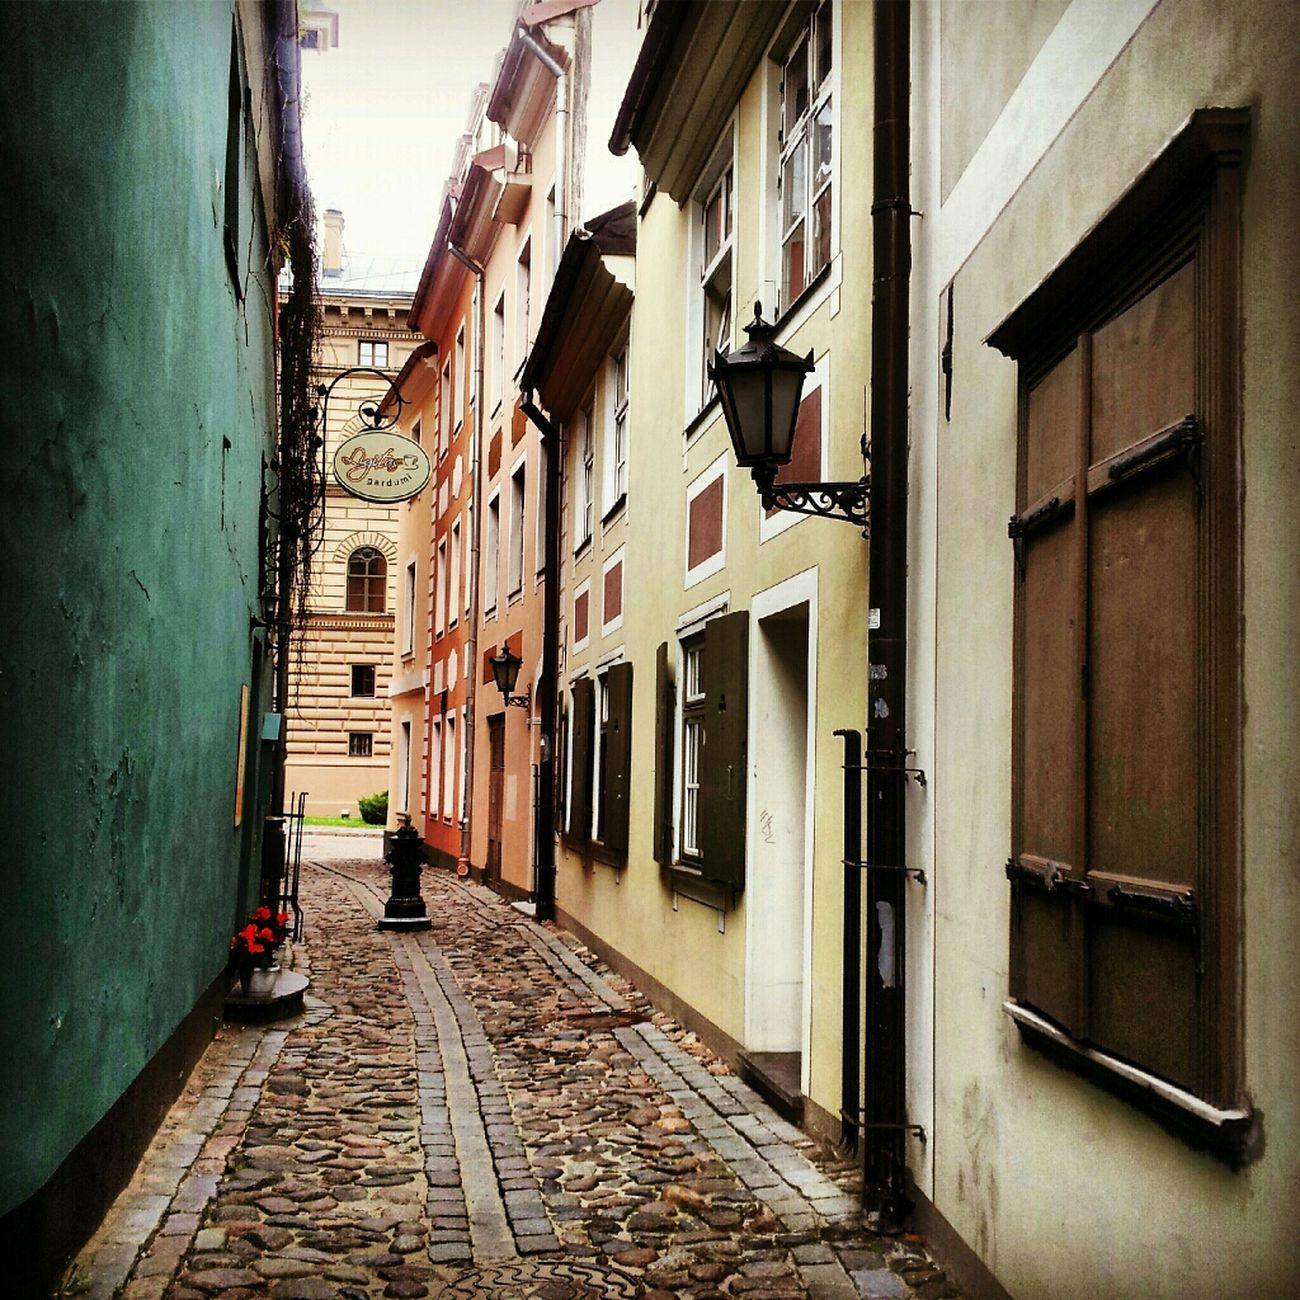 EyeEm Streetphotography Streetart Oldtown EyeEm Masterclass Riga Latvia Eye4photography  Ee_daily Buildinglover